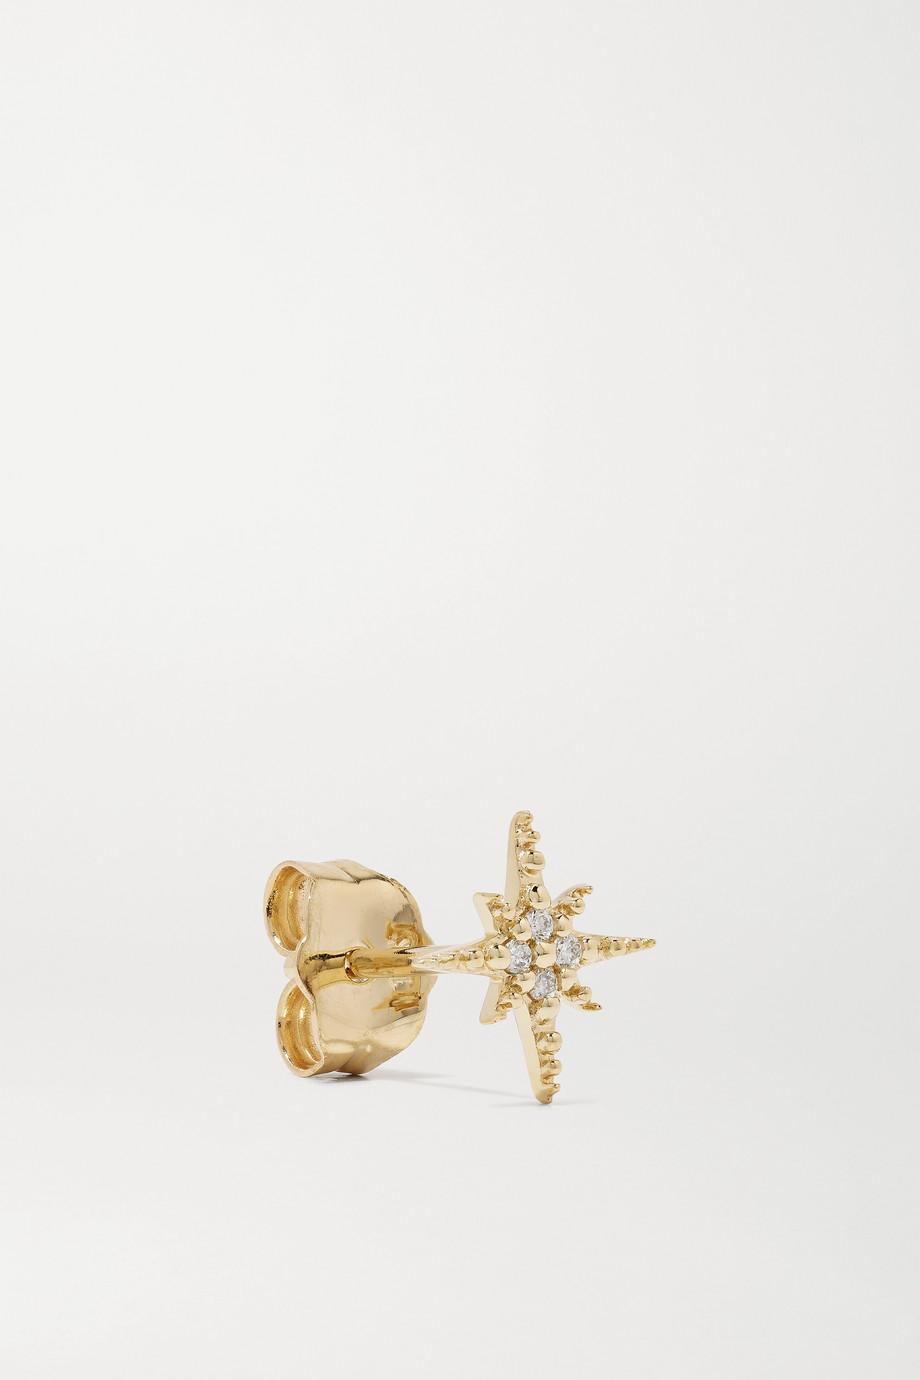 Sydney Evan Mini Starburst 14K 黄金钻石耳钉